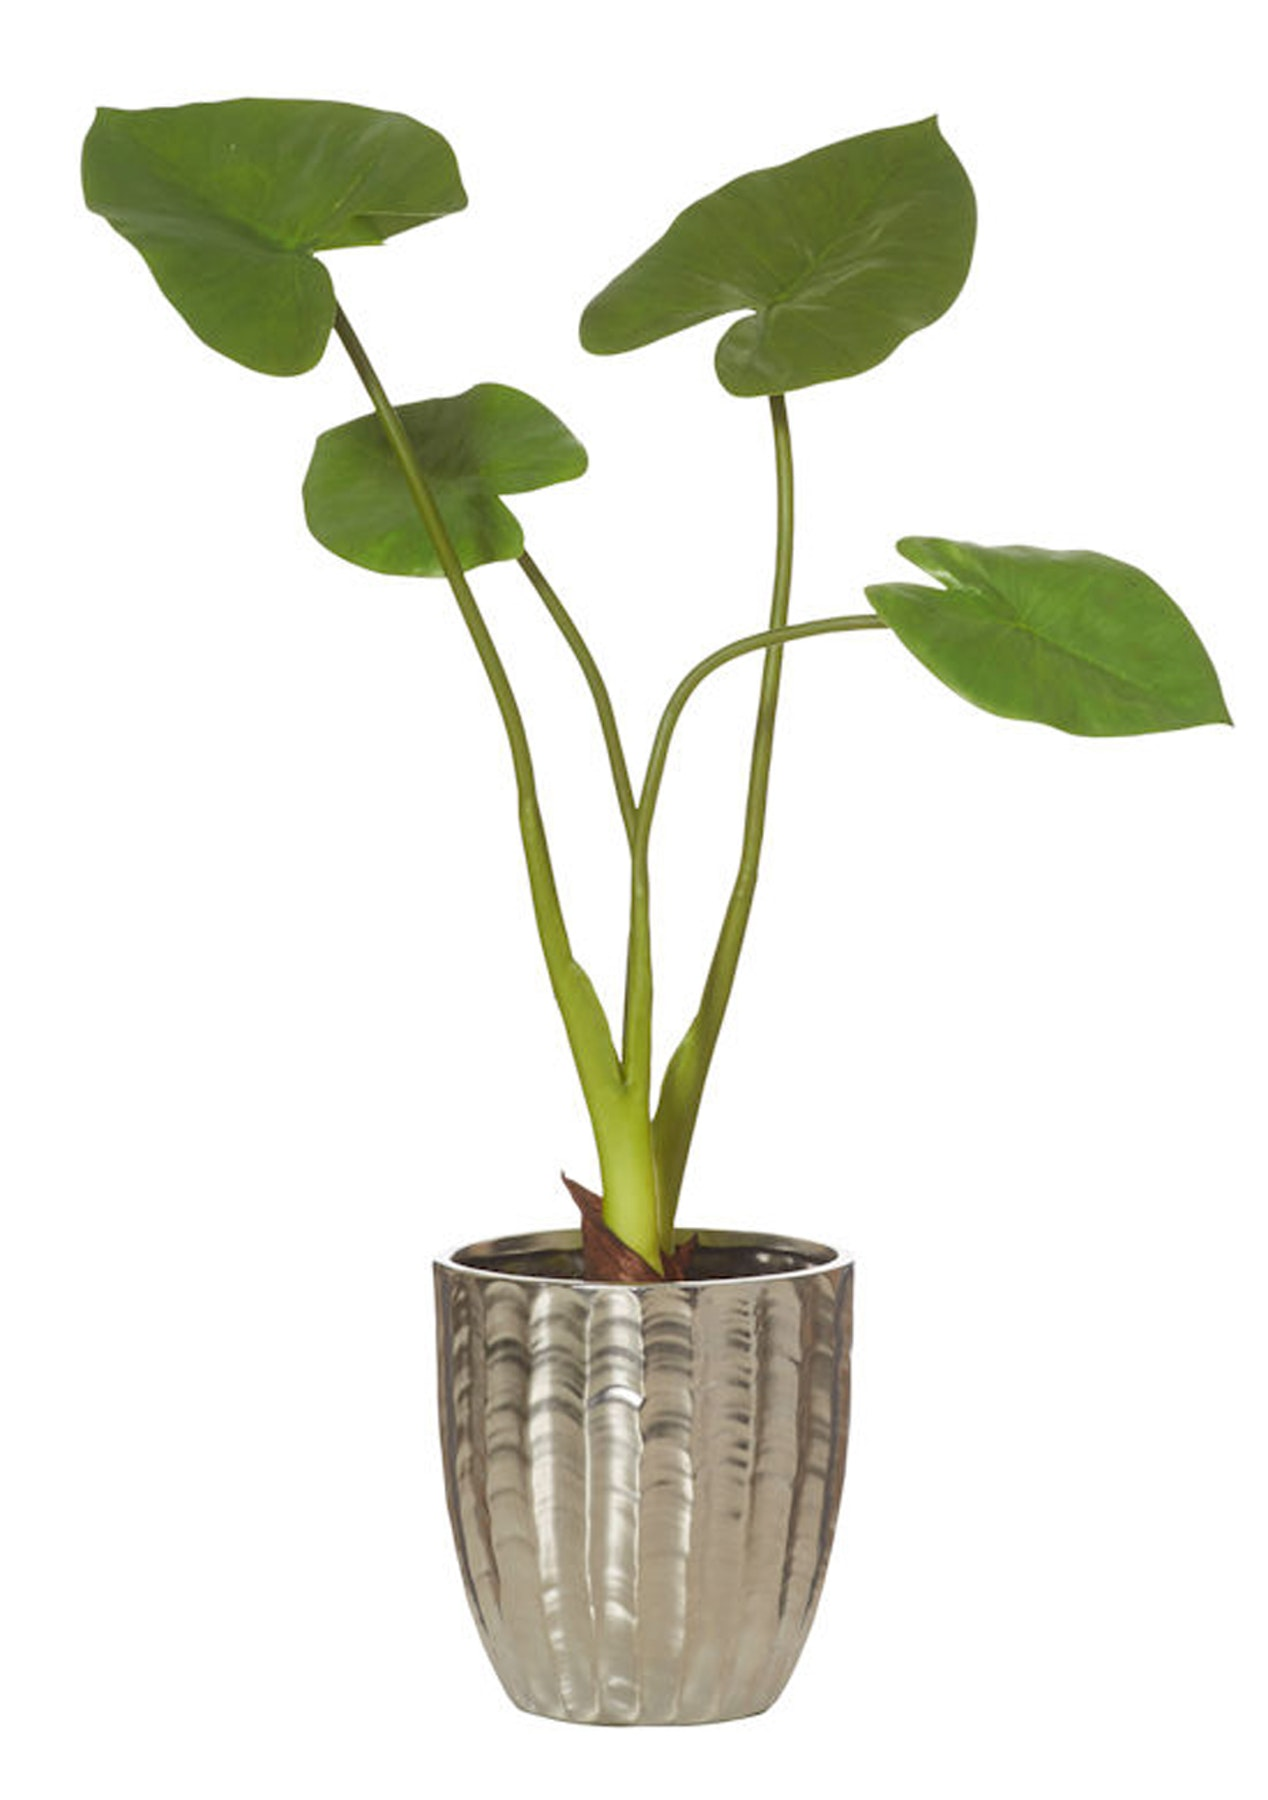 Rogue Taro Leaf In Pot Faux Indoor Plants Pots Onceit Navy